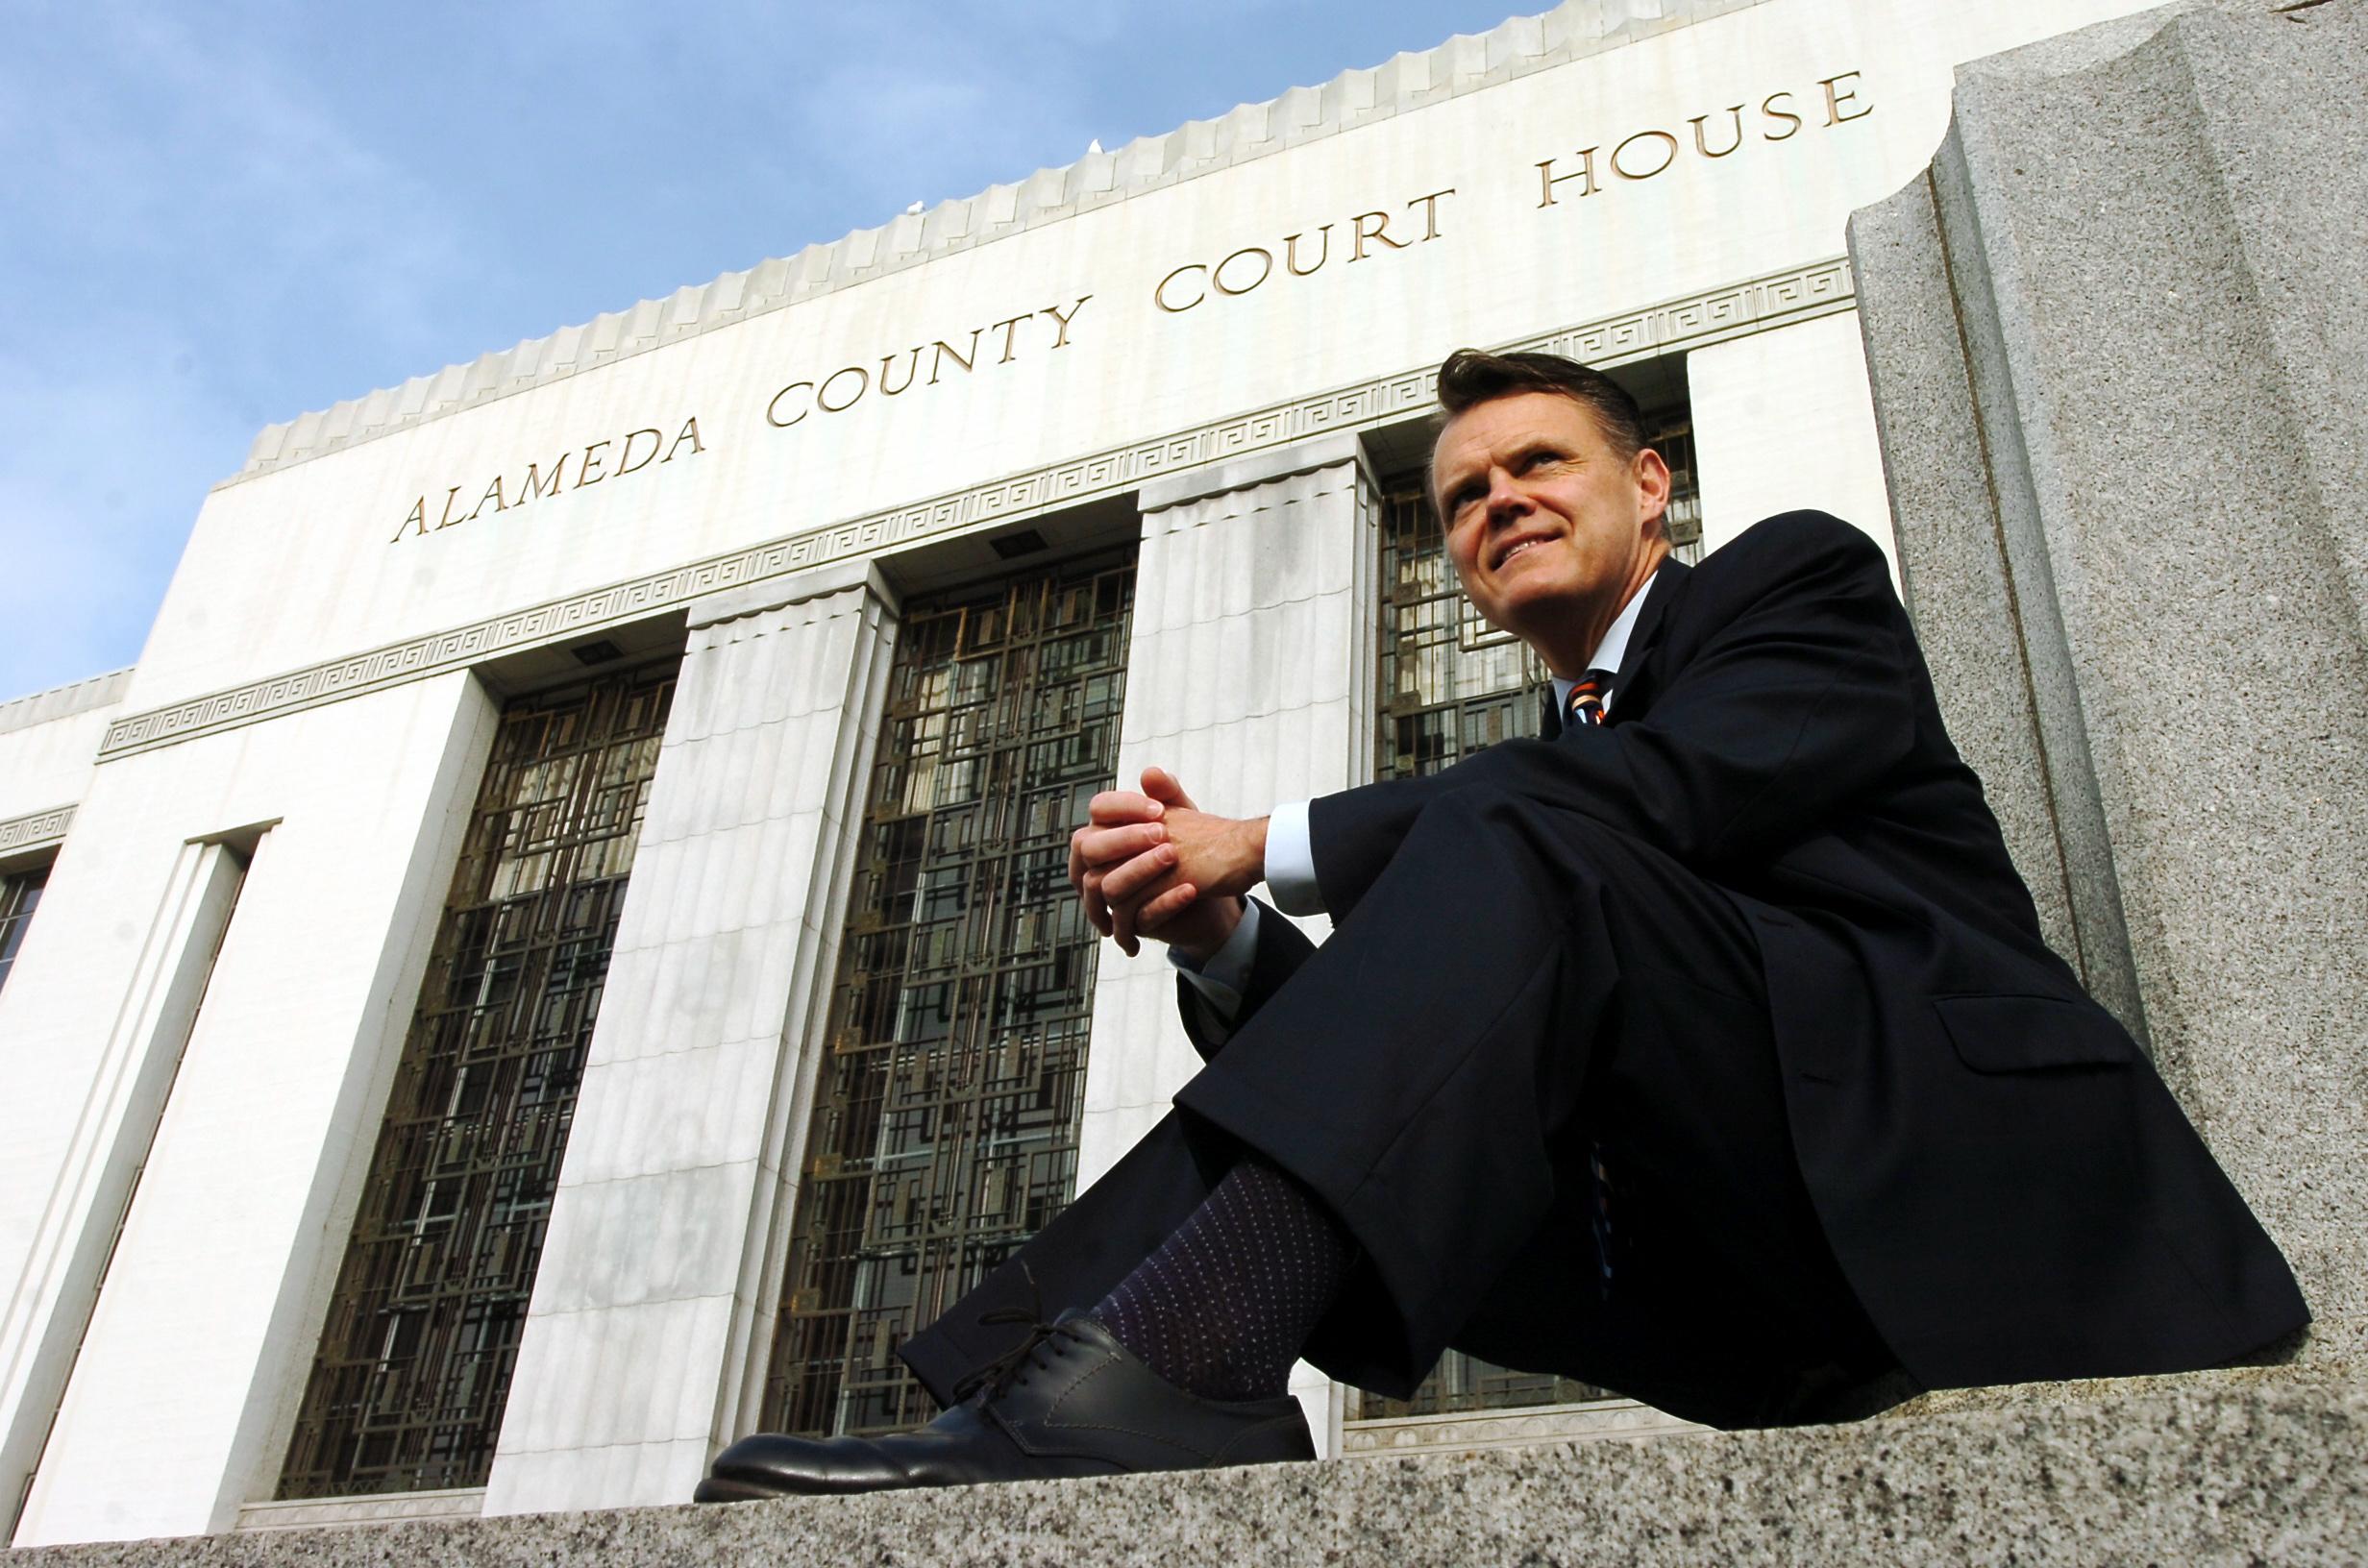 JUDGE TOM REARDON/FEATURES